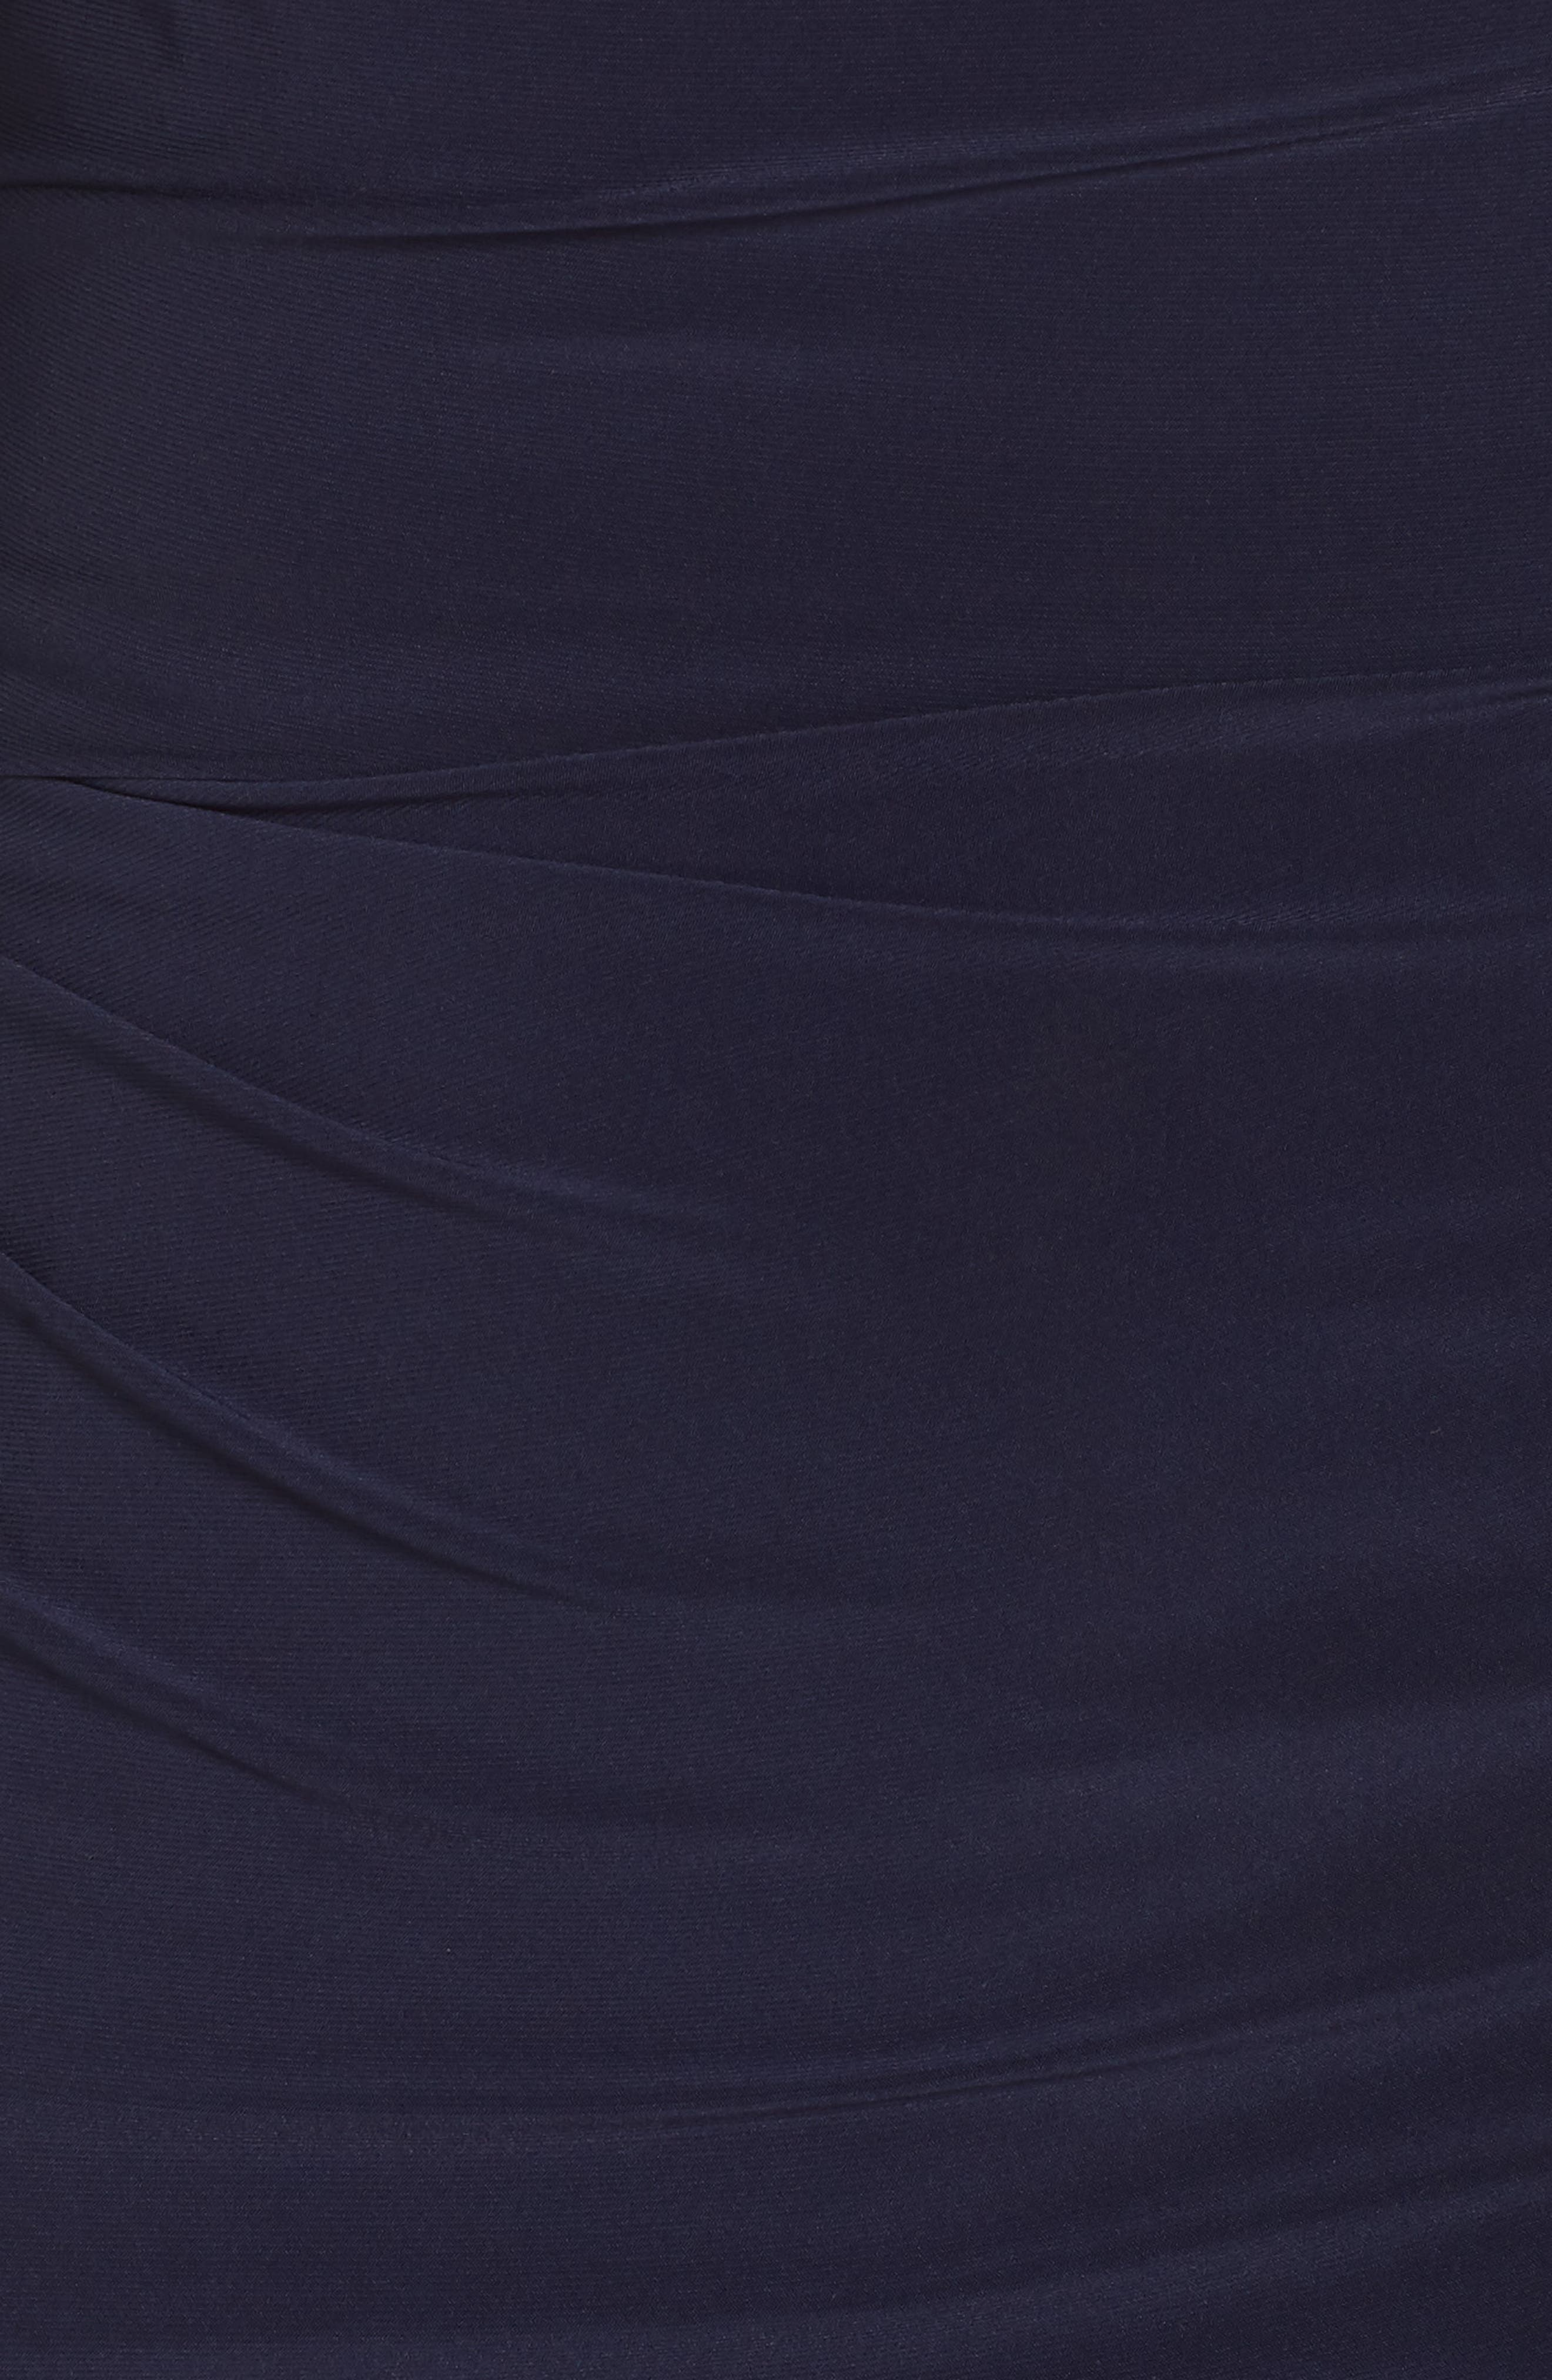 VINCE CAMUTO, Long Sleeve Bateau Neck Cocktail Dress, Alternate thumbnail 6, color, NAVY